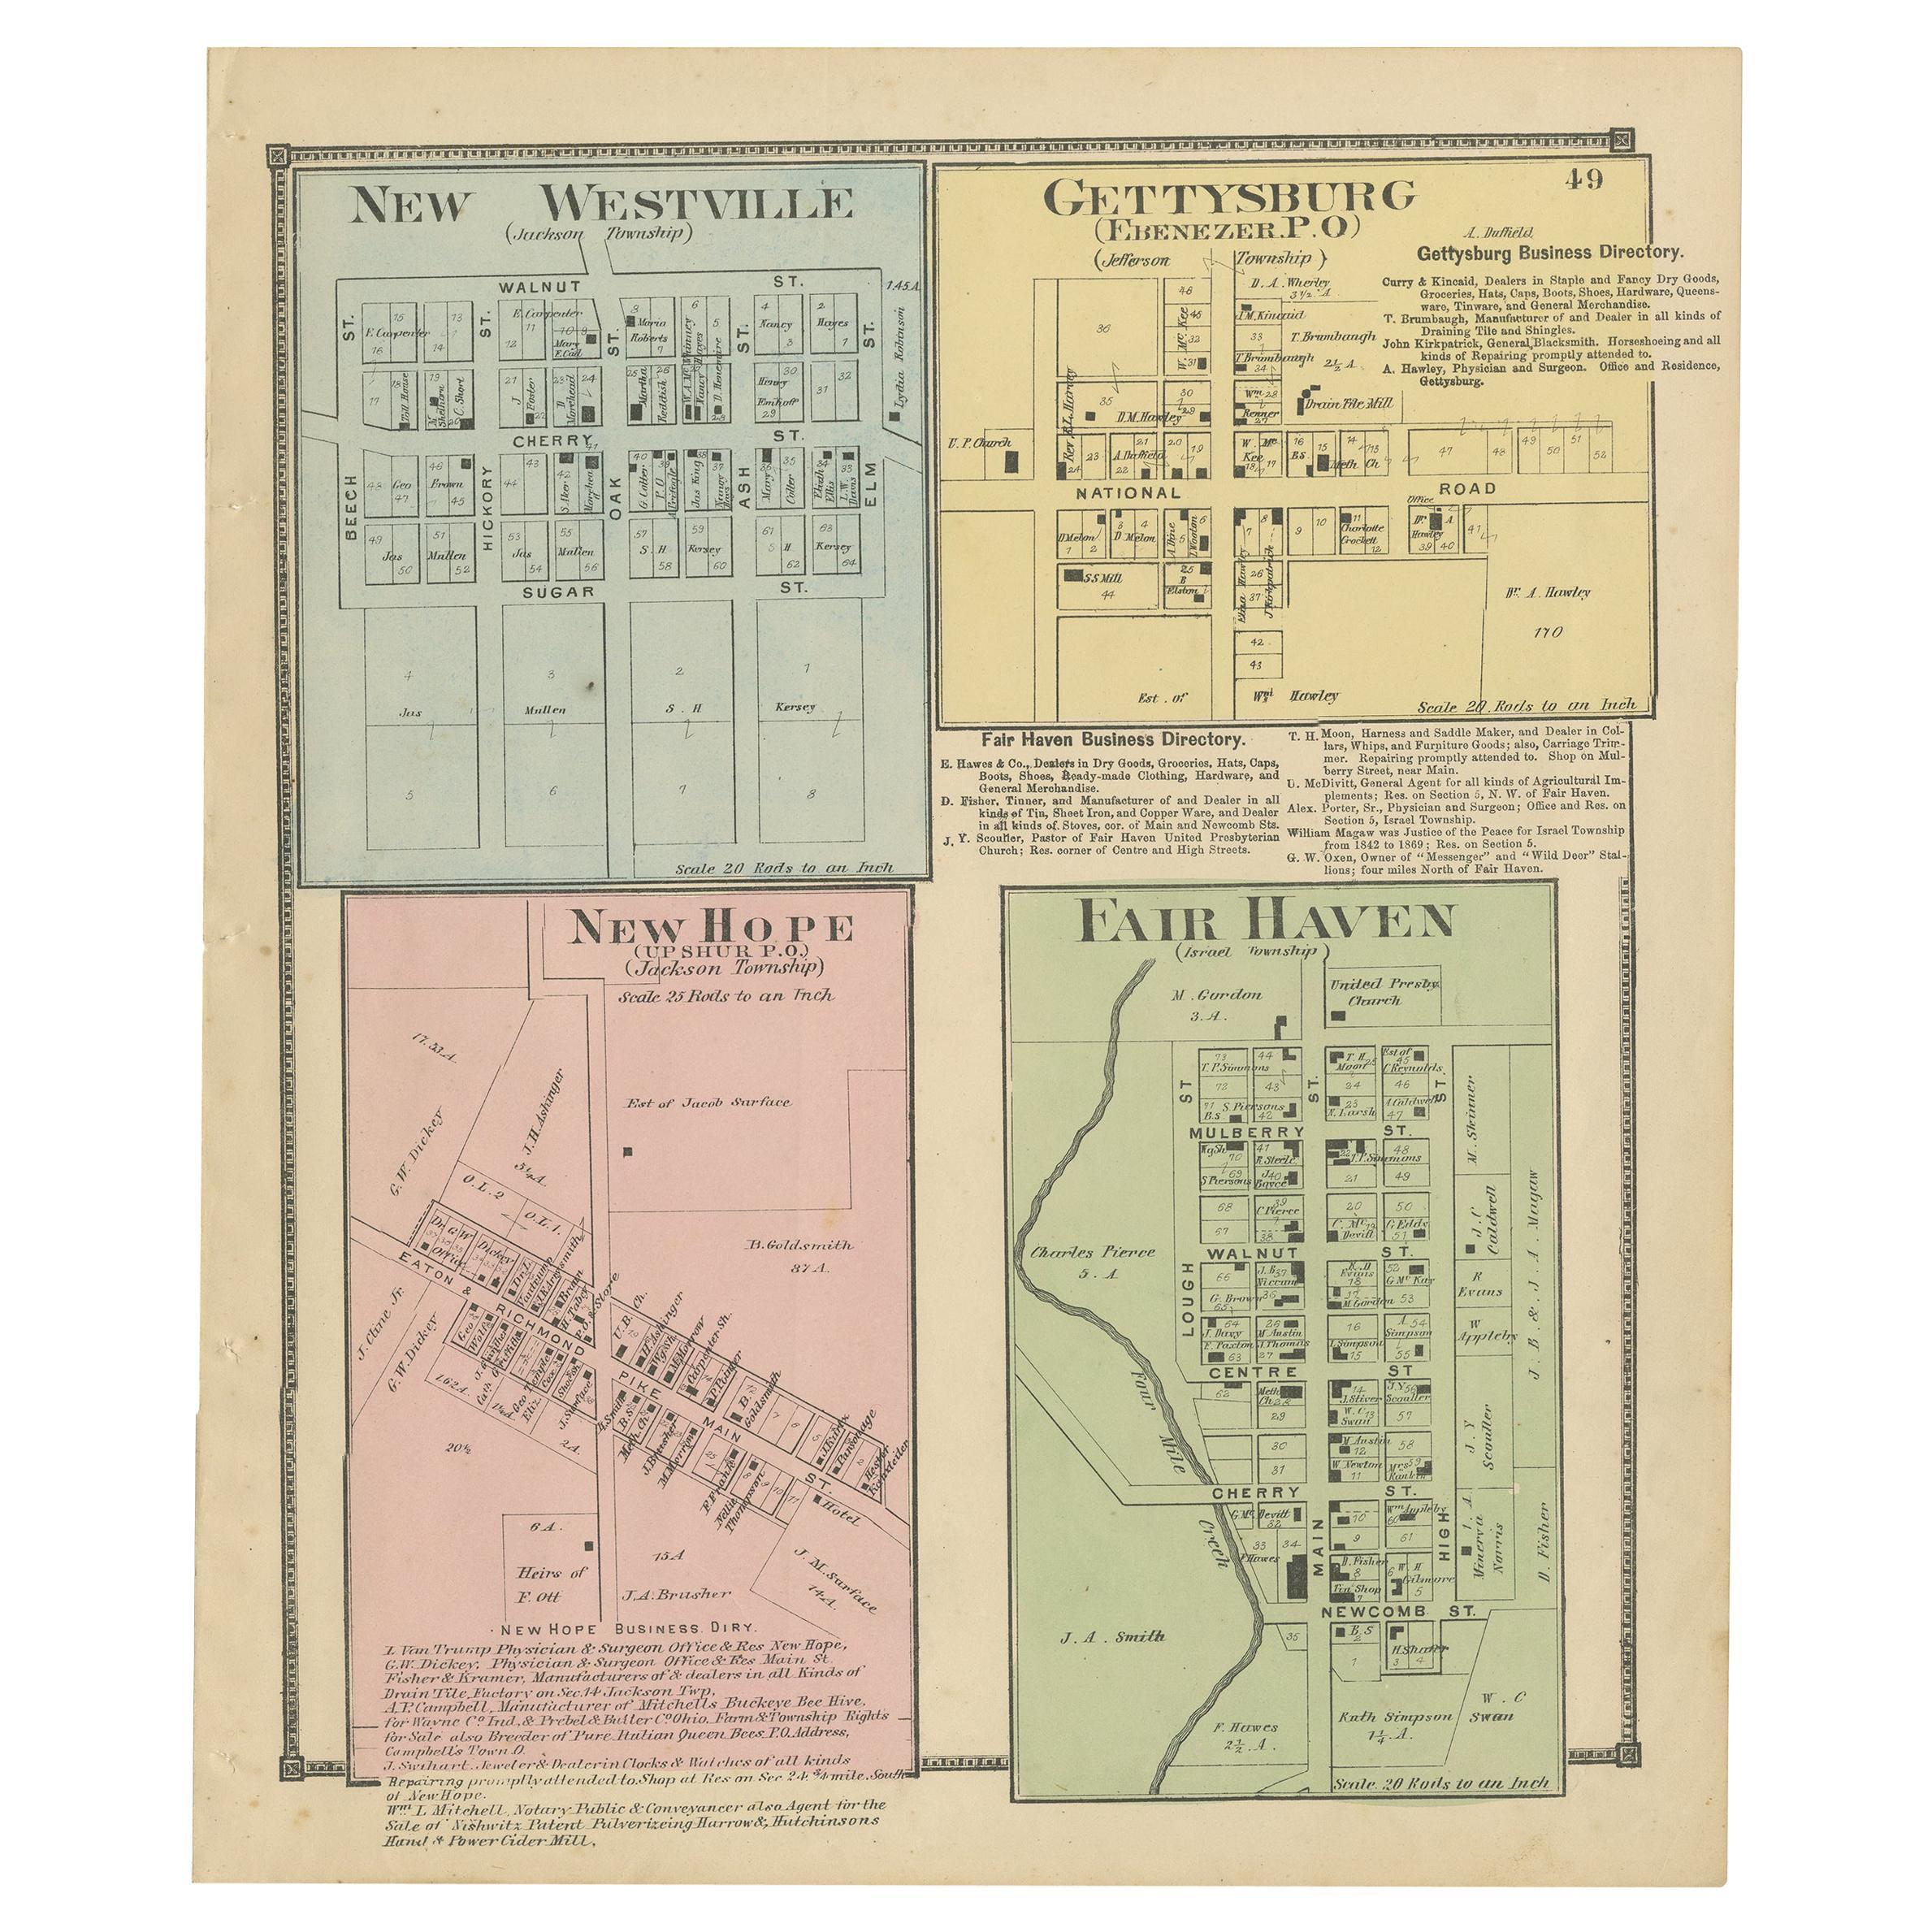 Antique Map of New Westville, Gettysburg, New Hope & Fair Haven, 1871